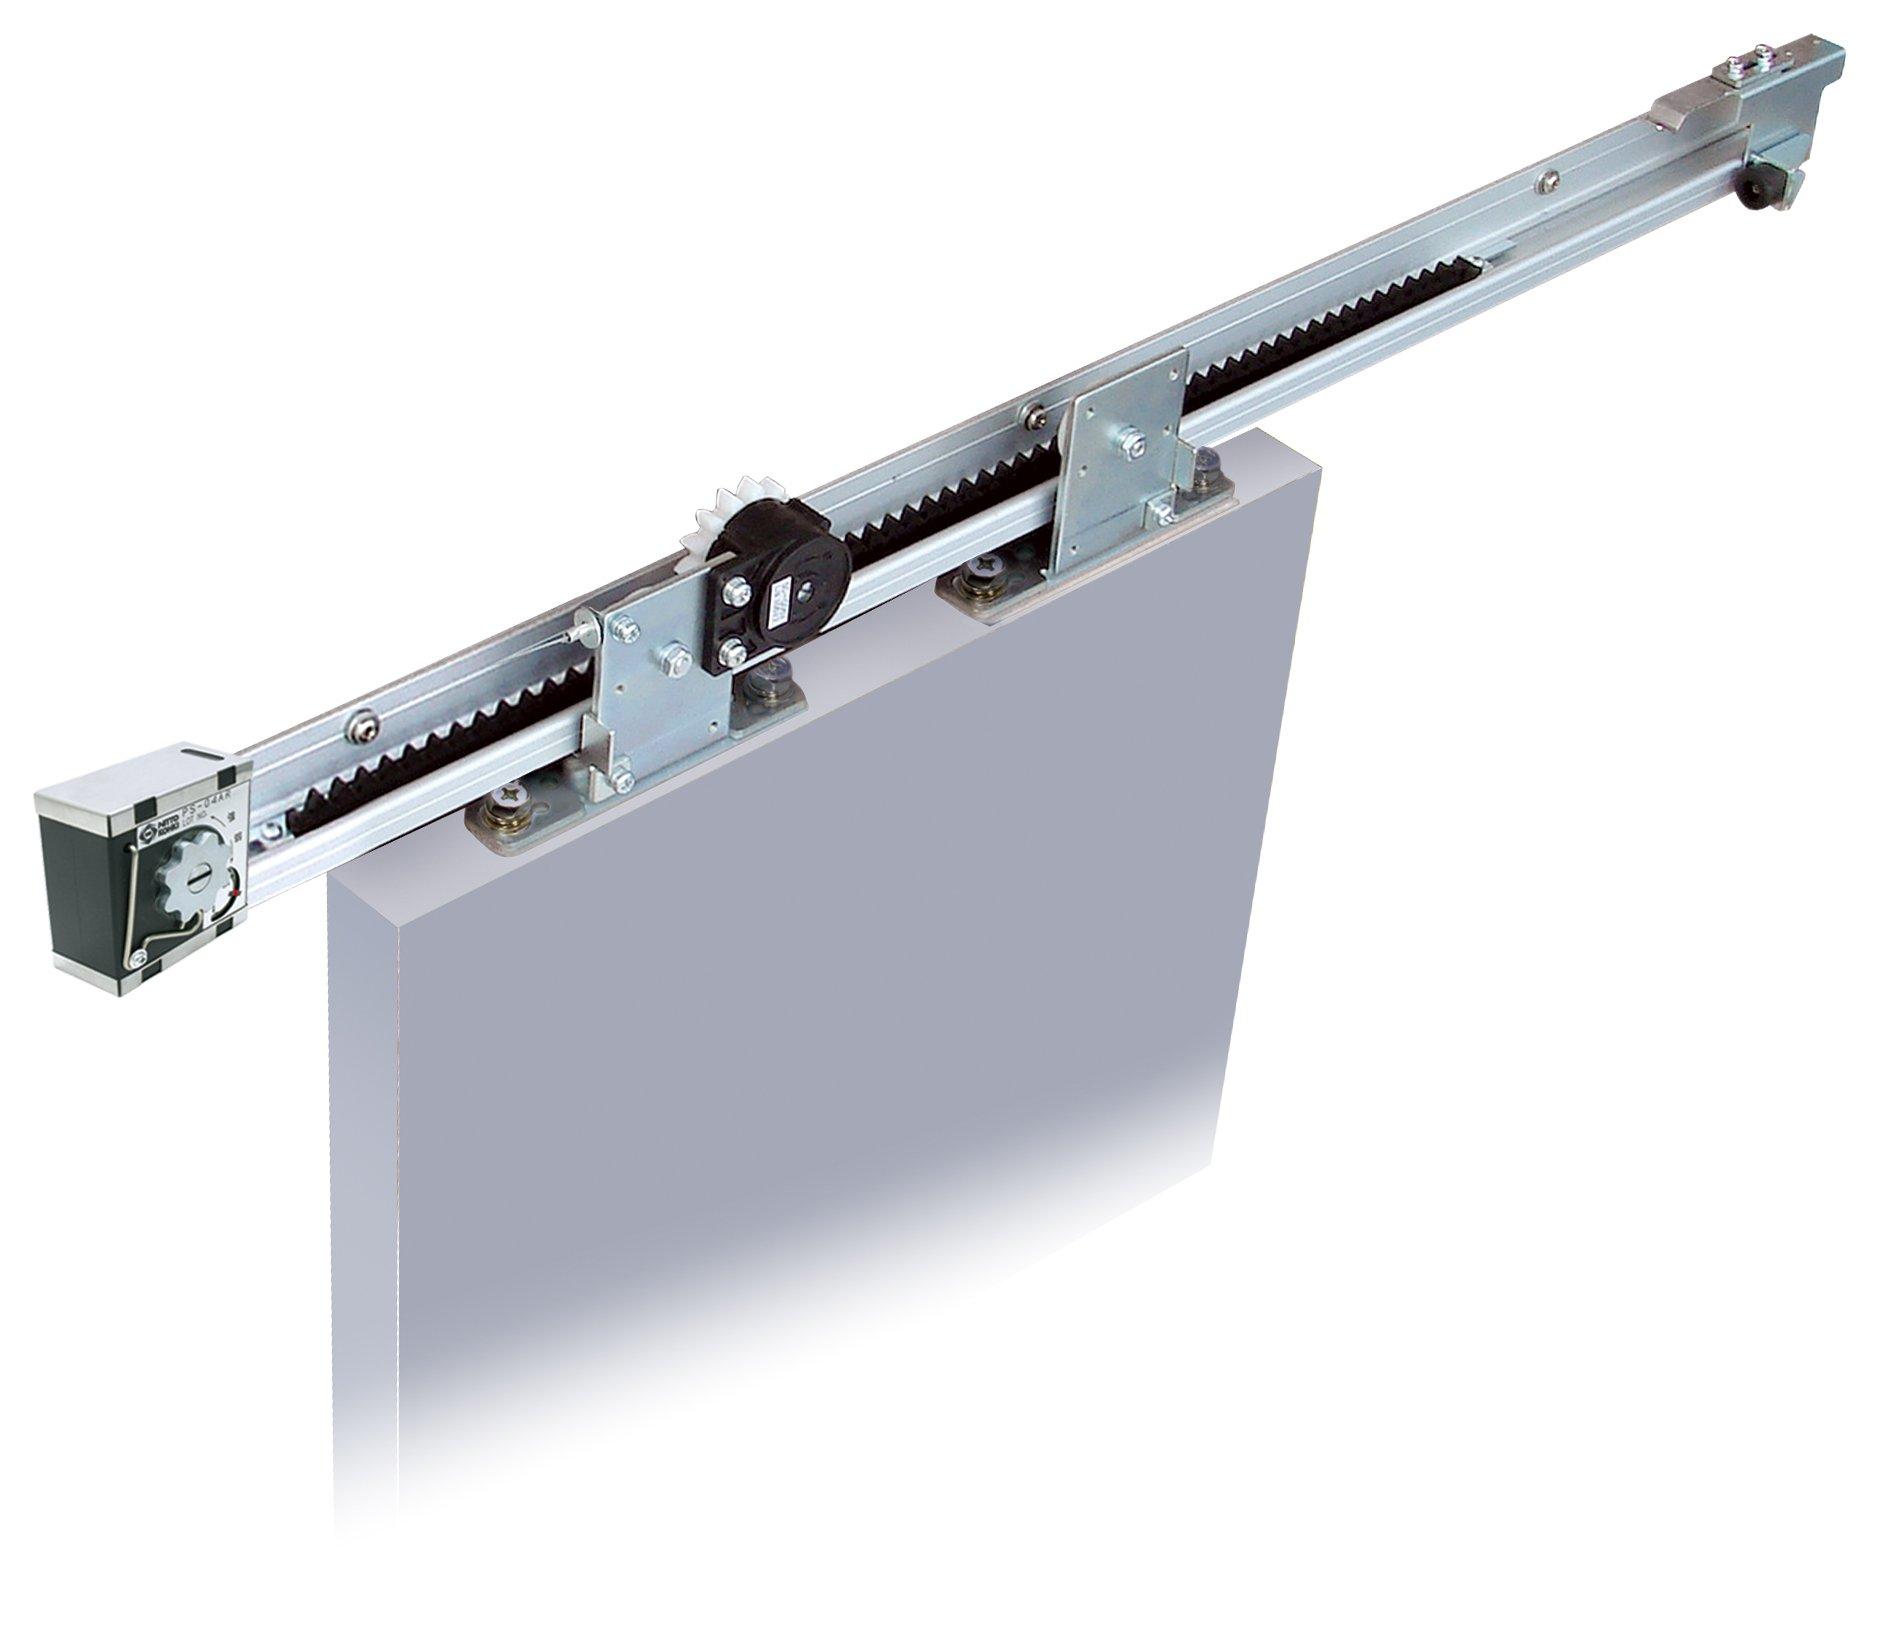 NSC-C60V-22 Sliding Door Closer for barn door (Medium-Heavy Duty Model up to 132lbs doors), Self Closing, Complete System With 86'' Rrail